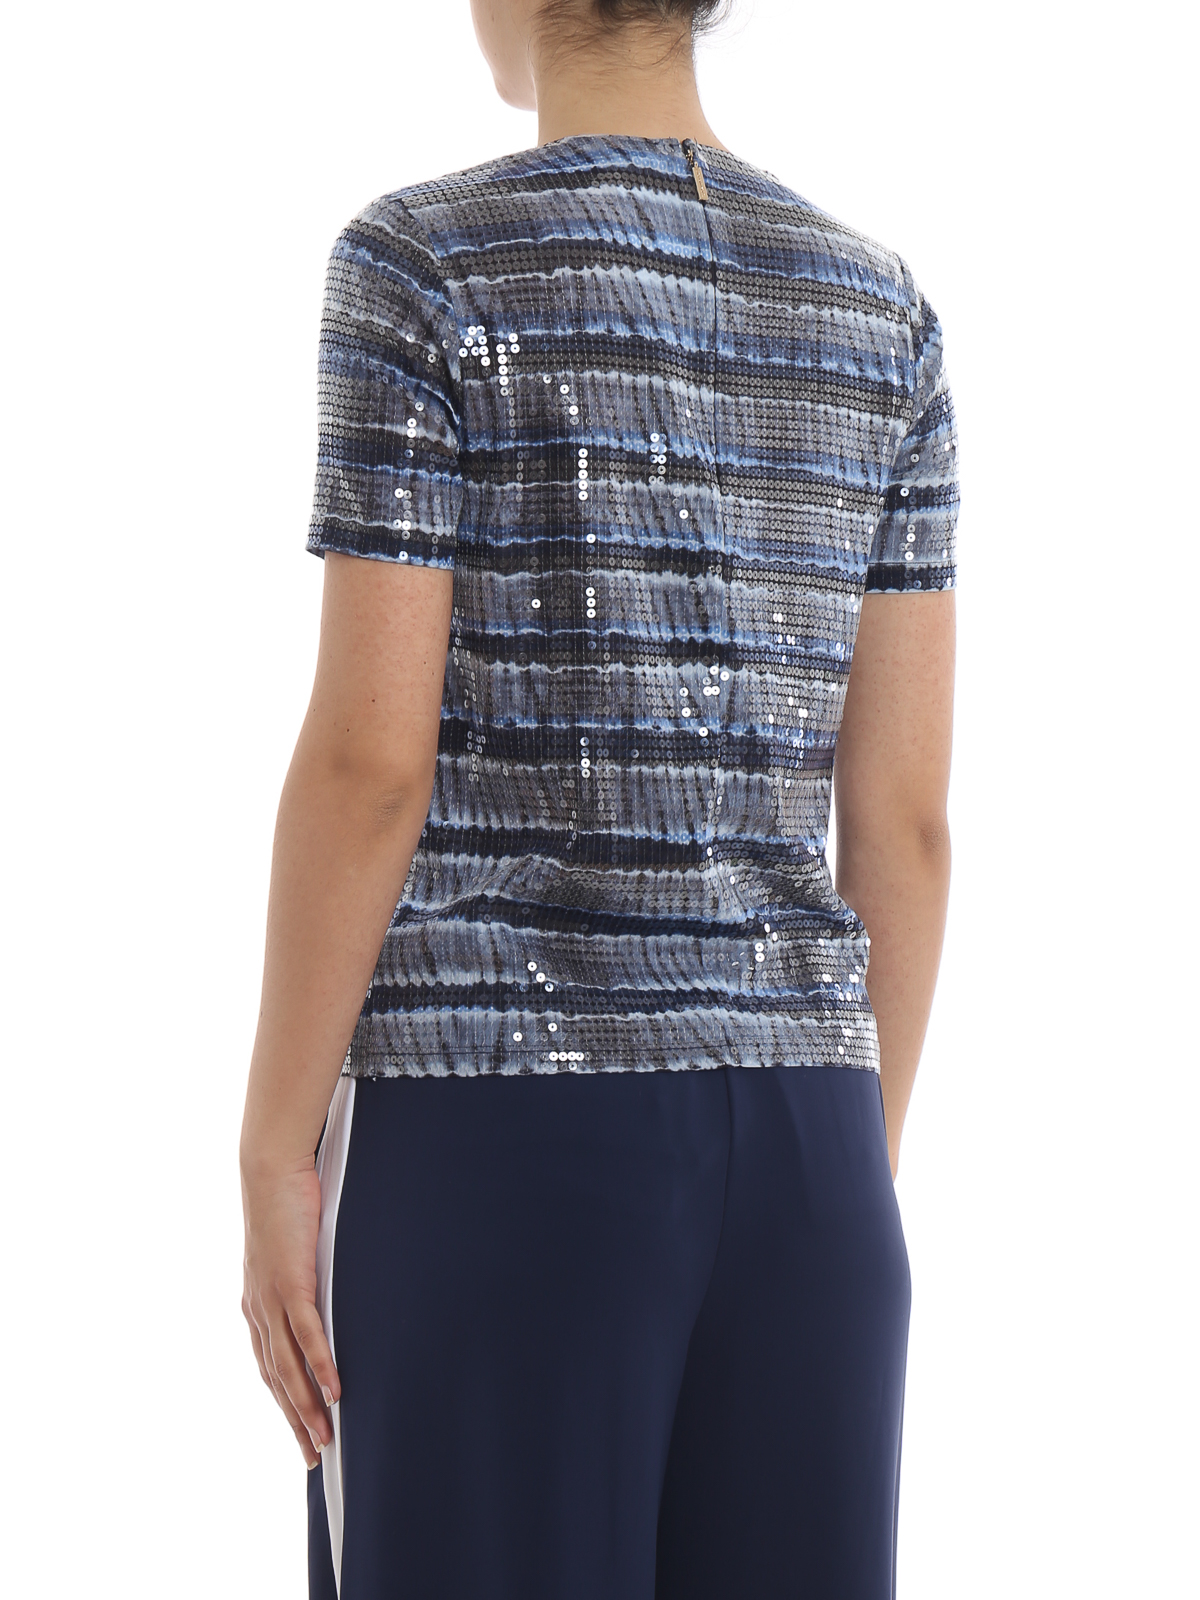 132b303eeb6 Michael Kors - Sequined striped T-shirt - t-shirts - MS95M38AZP789